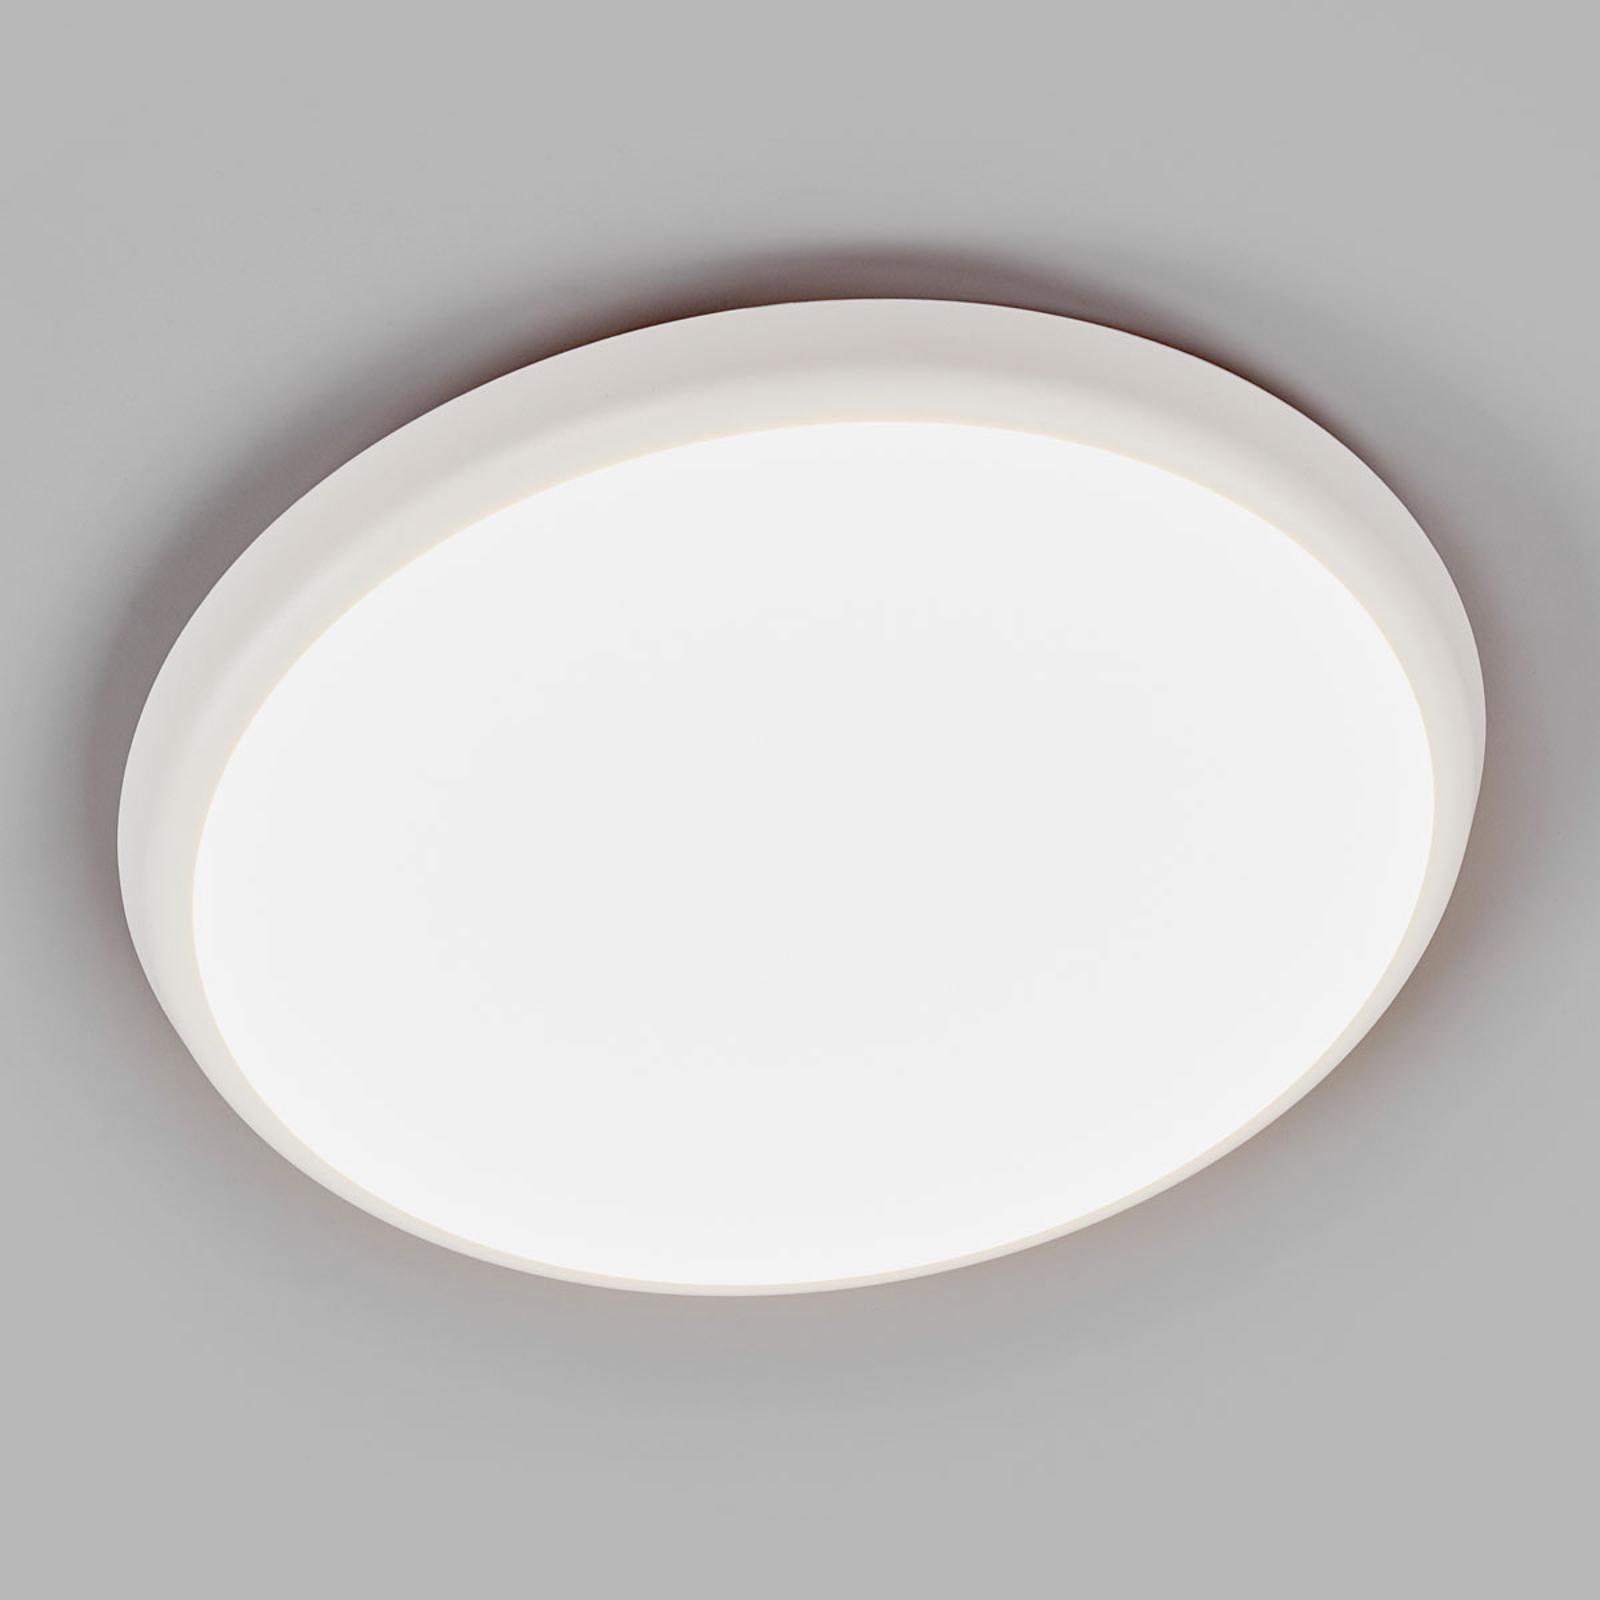 Eenvoudige LED plafondlamp Augustin, 30 cm